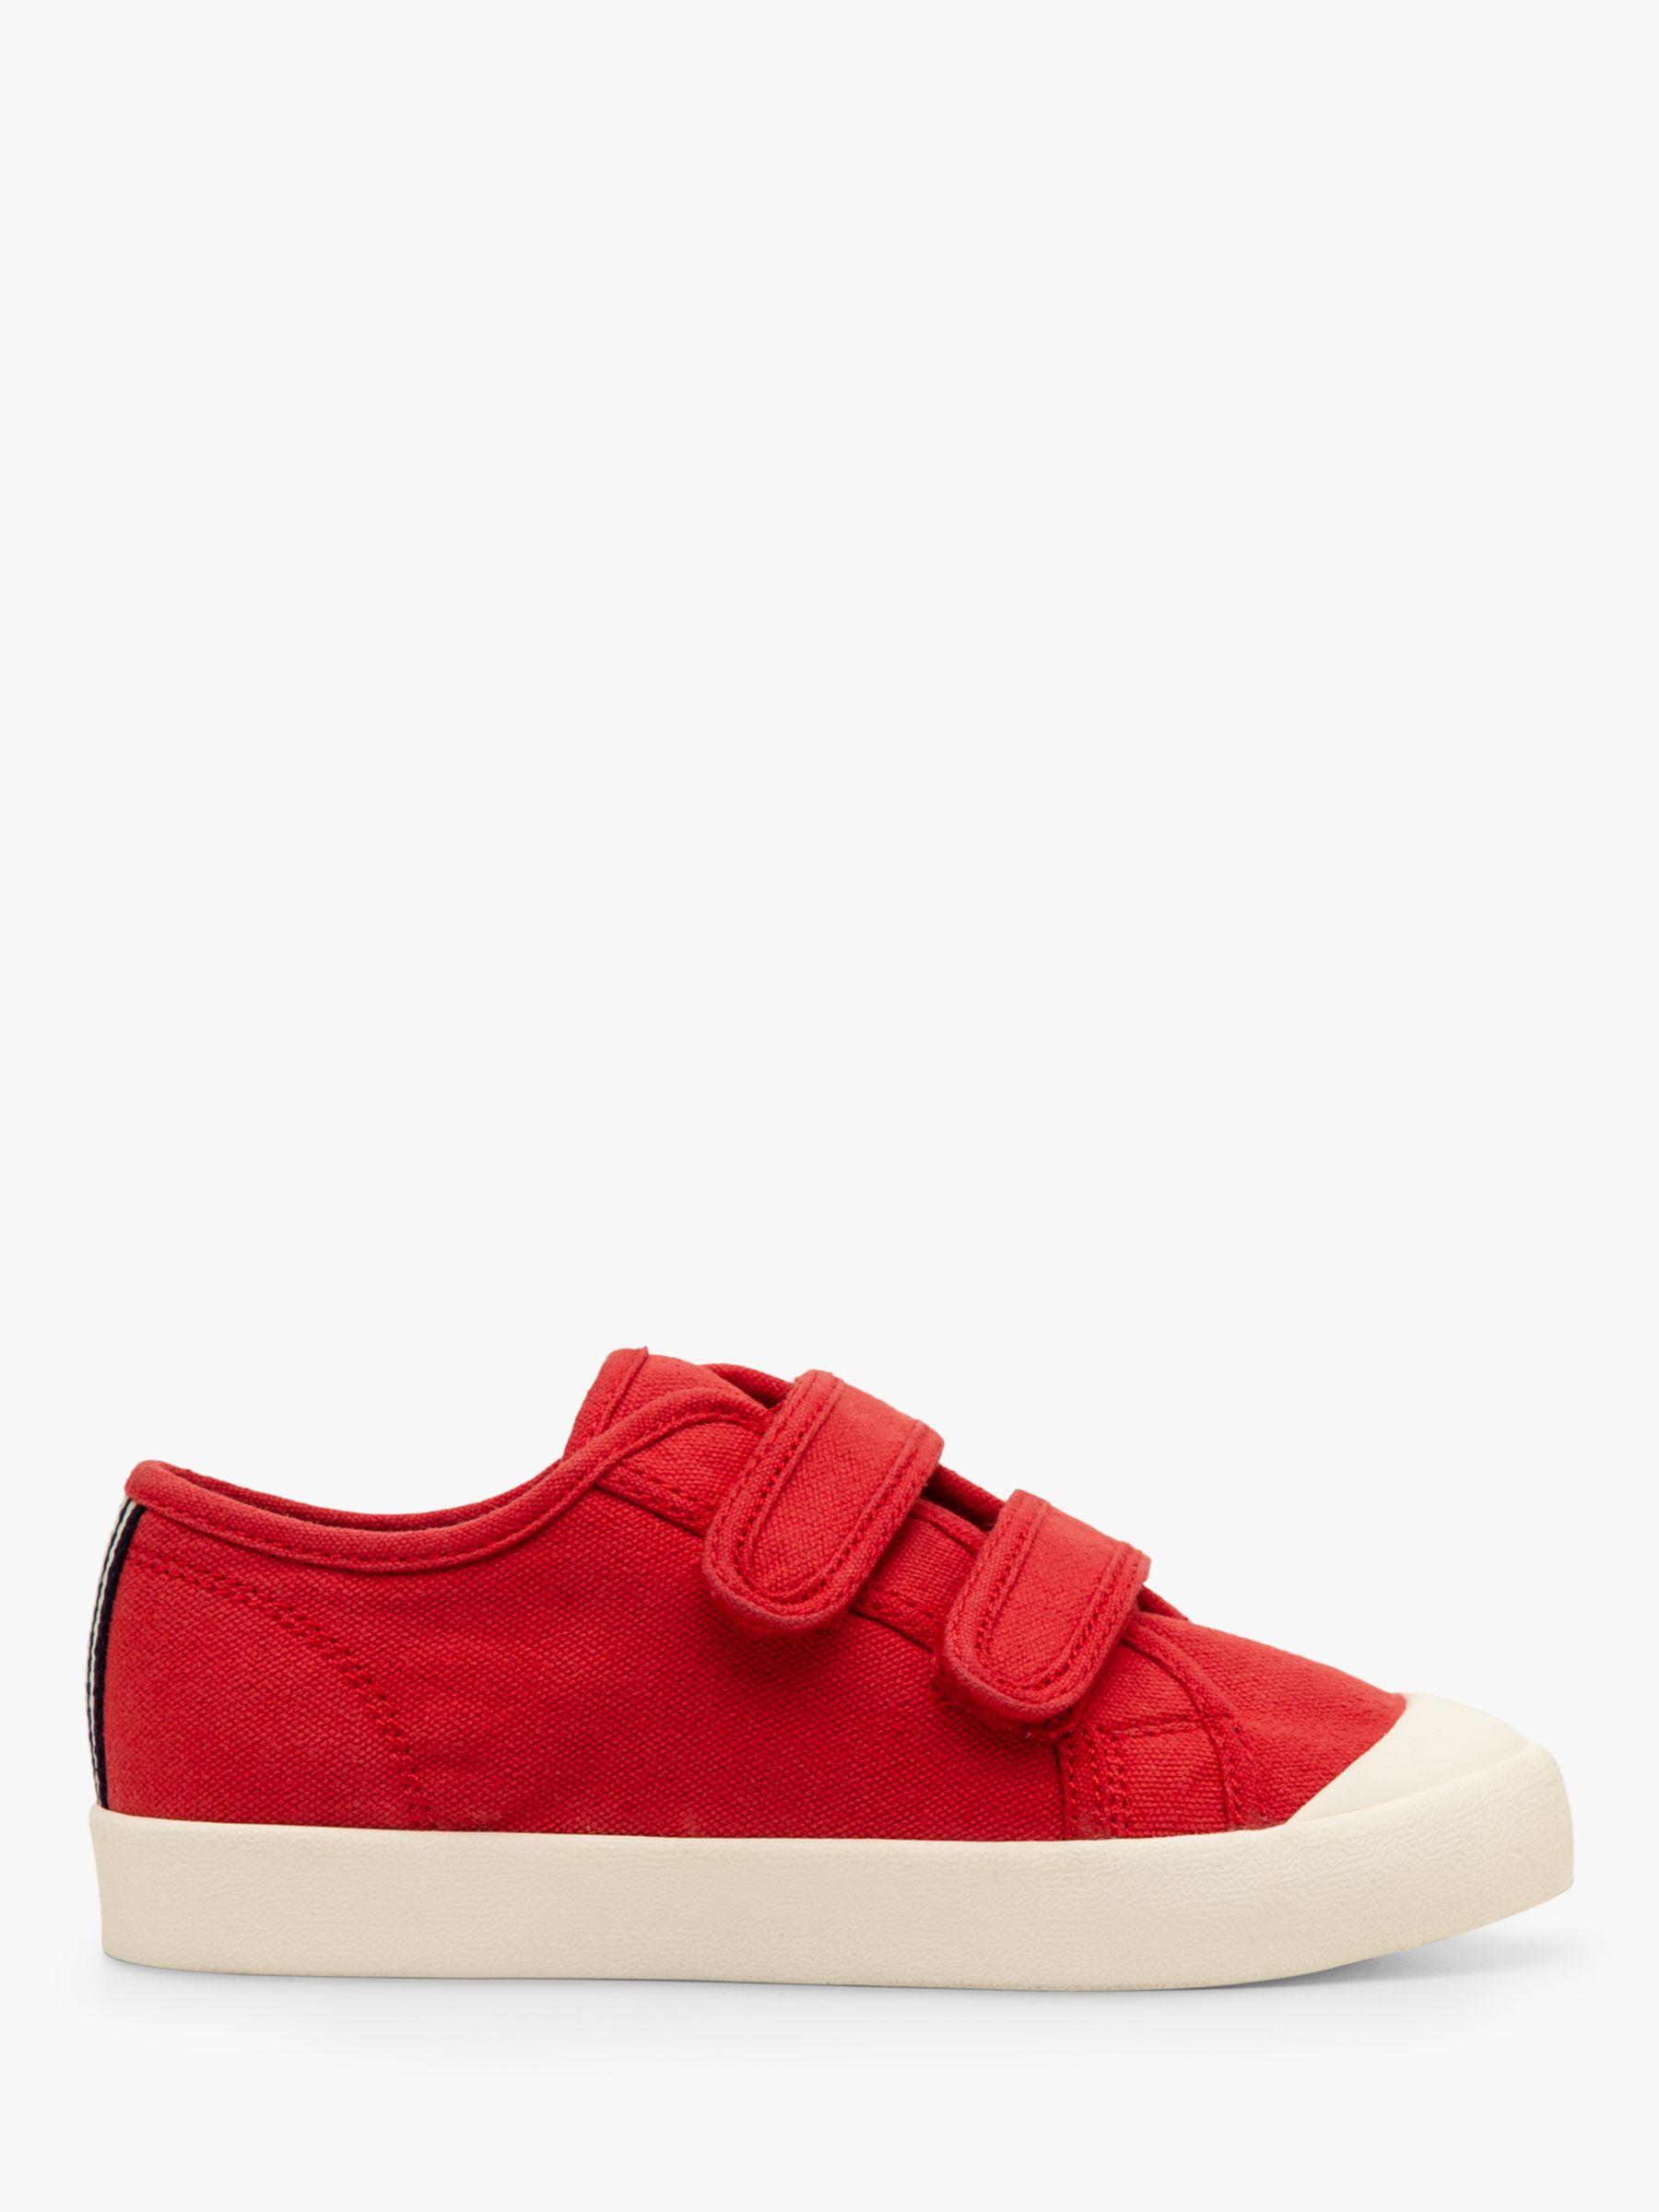 Mini Boden Mini Boden Children's Double Strap Canvas Shoes